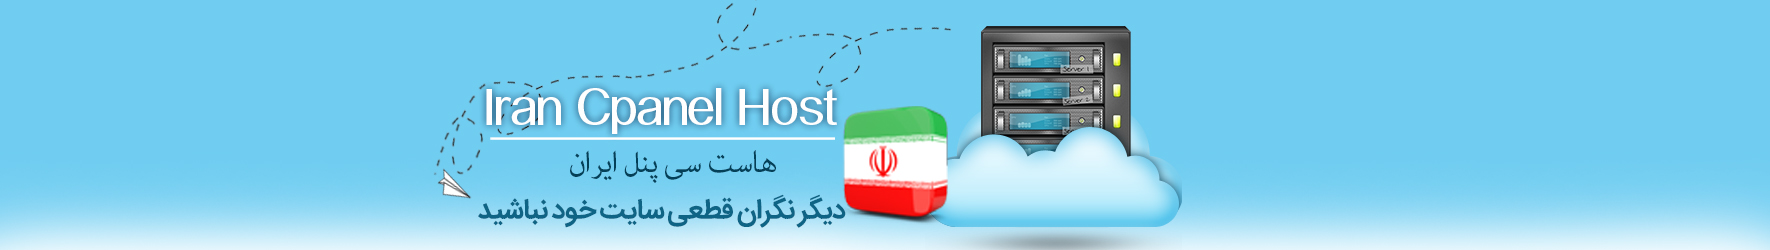 iran cpanel host